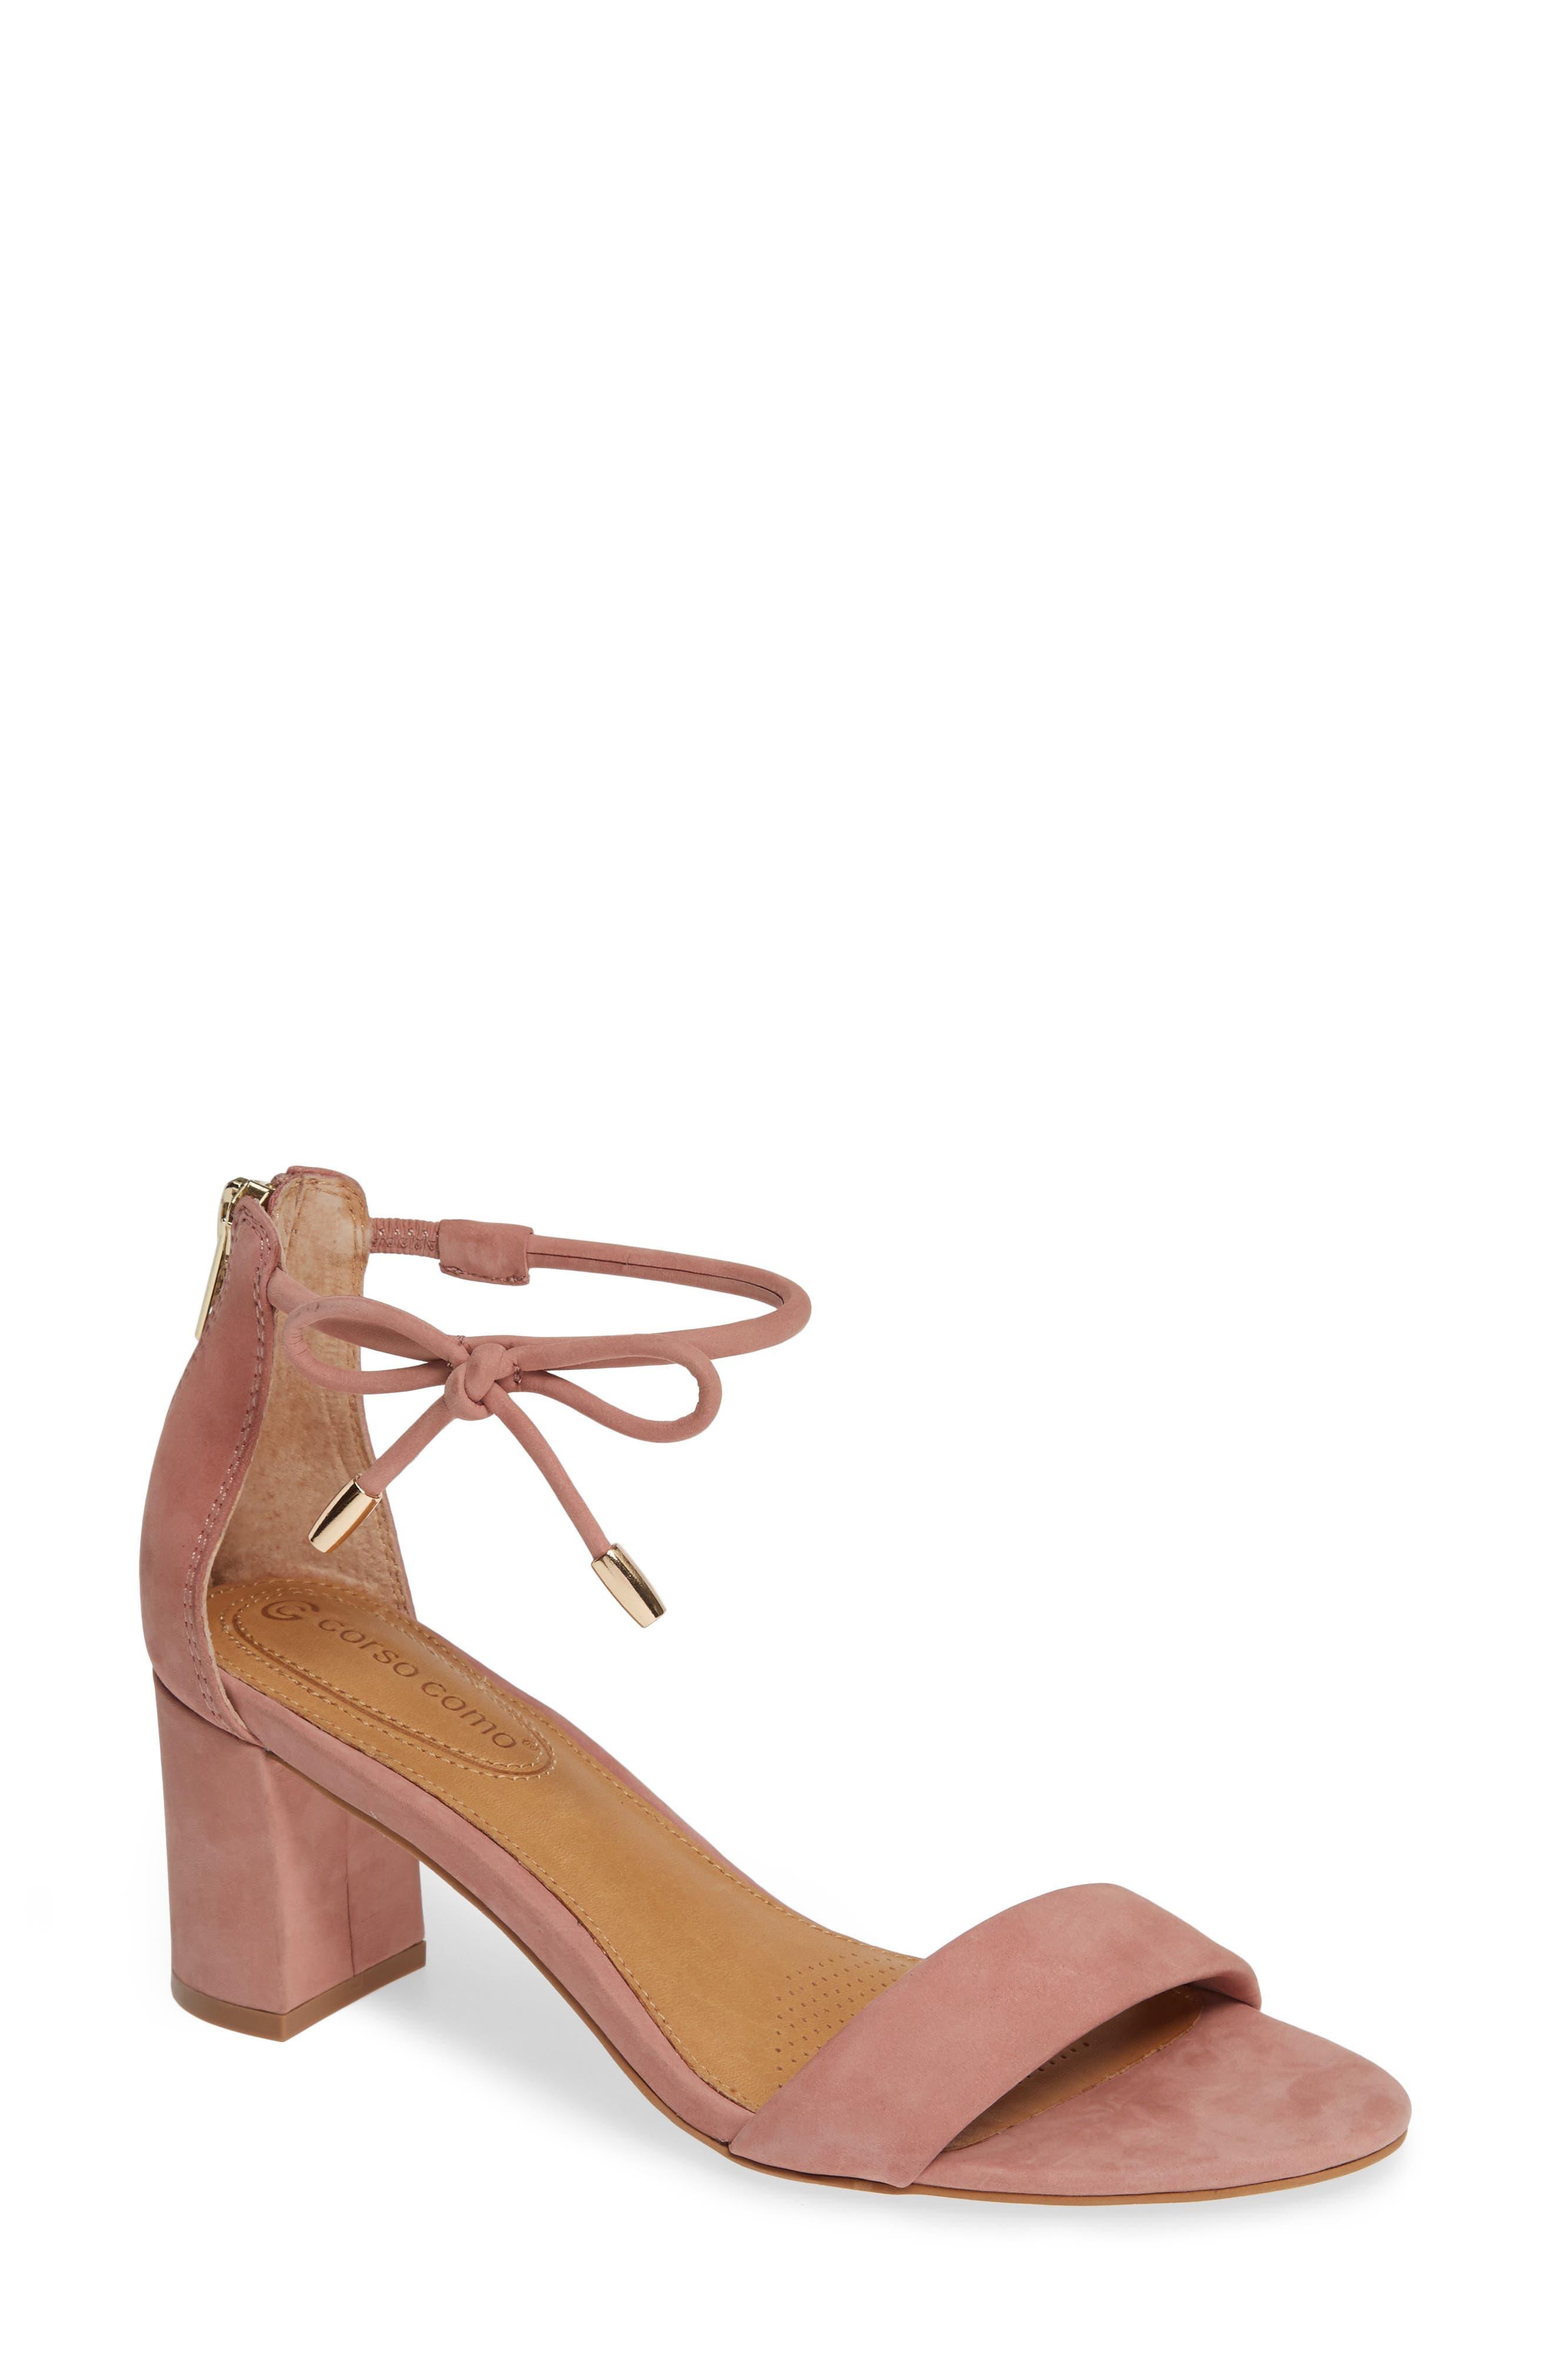 Celebratt Ankle Strap Sandal,                             Main thumbnail 1, color,                             OLD ROSE NUBUCK LEATHER